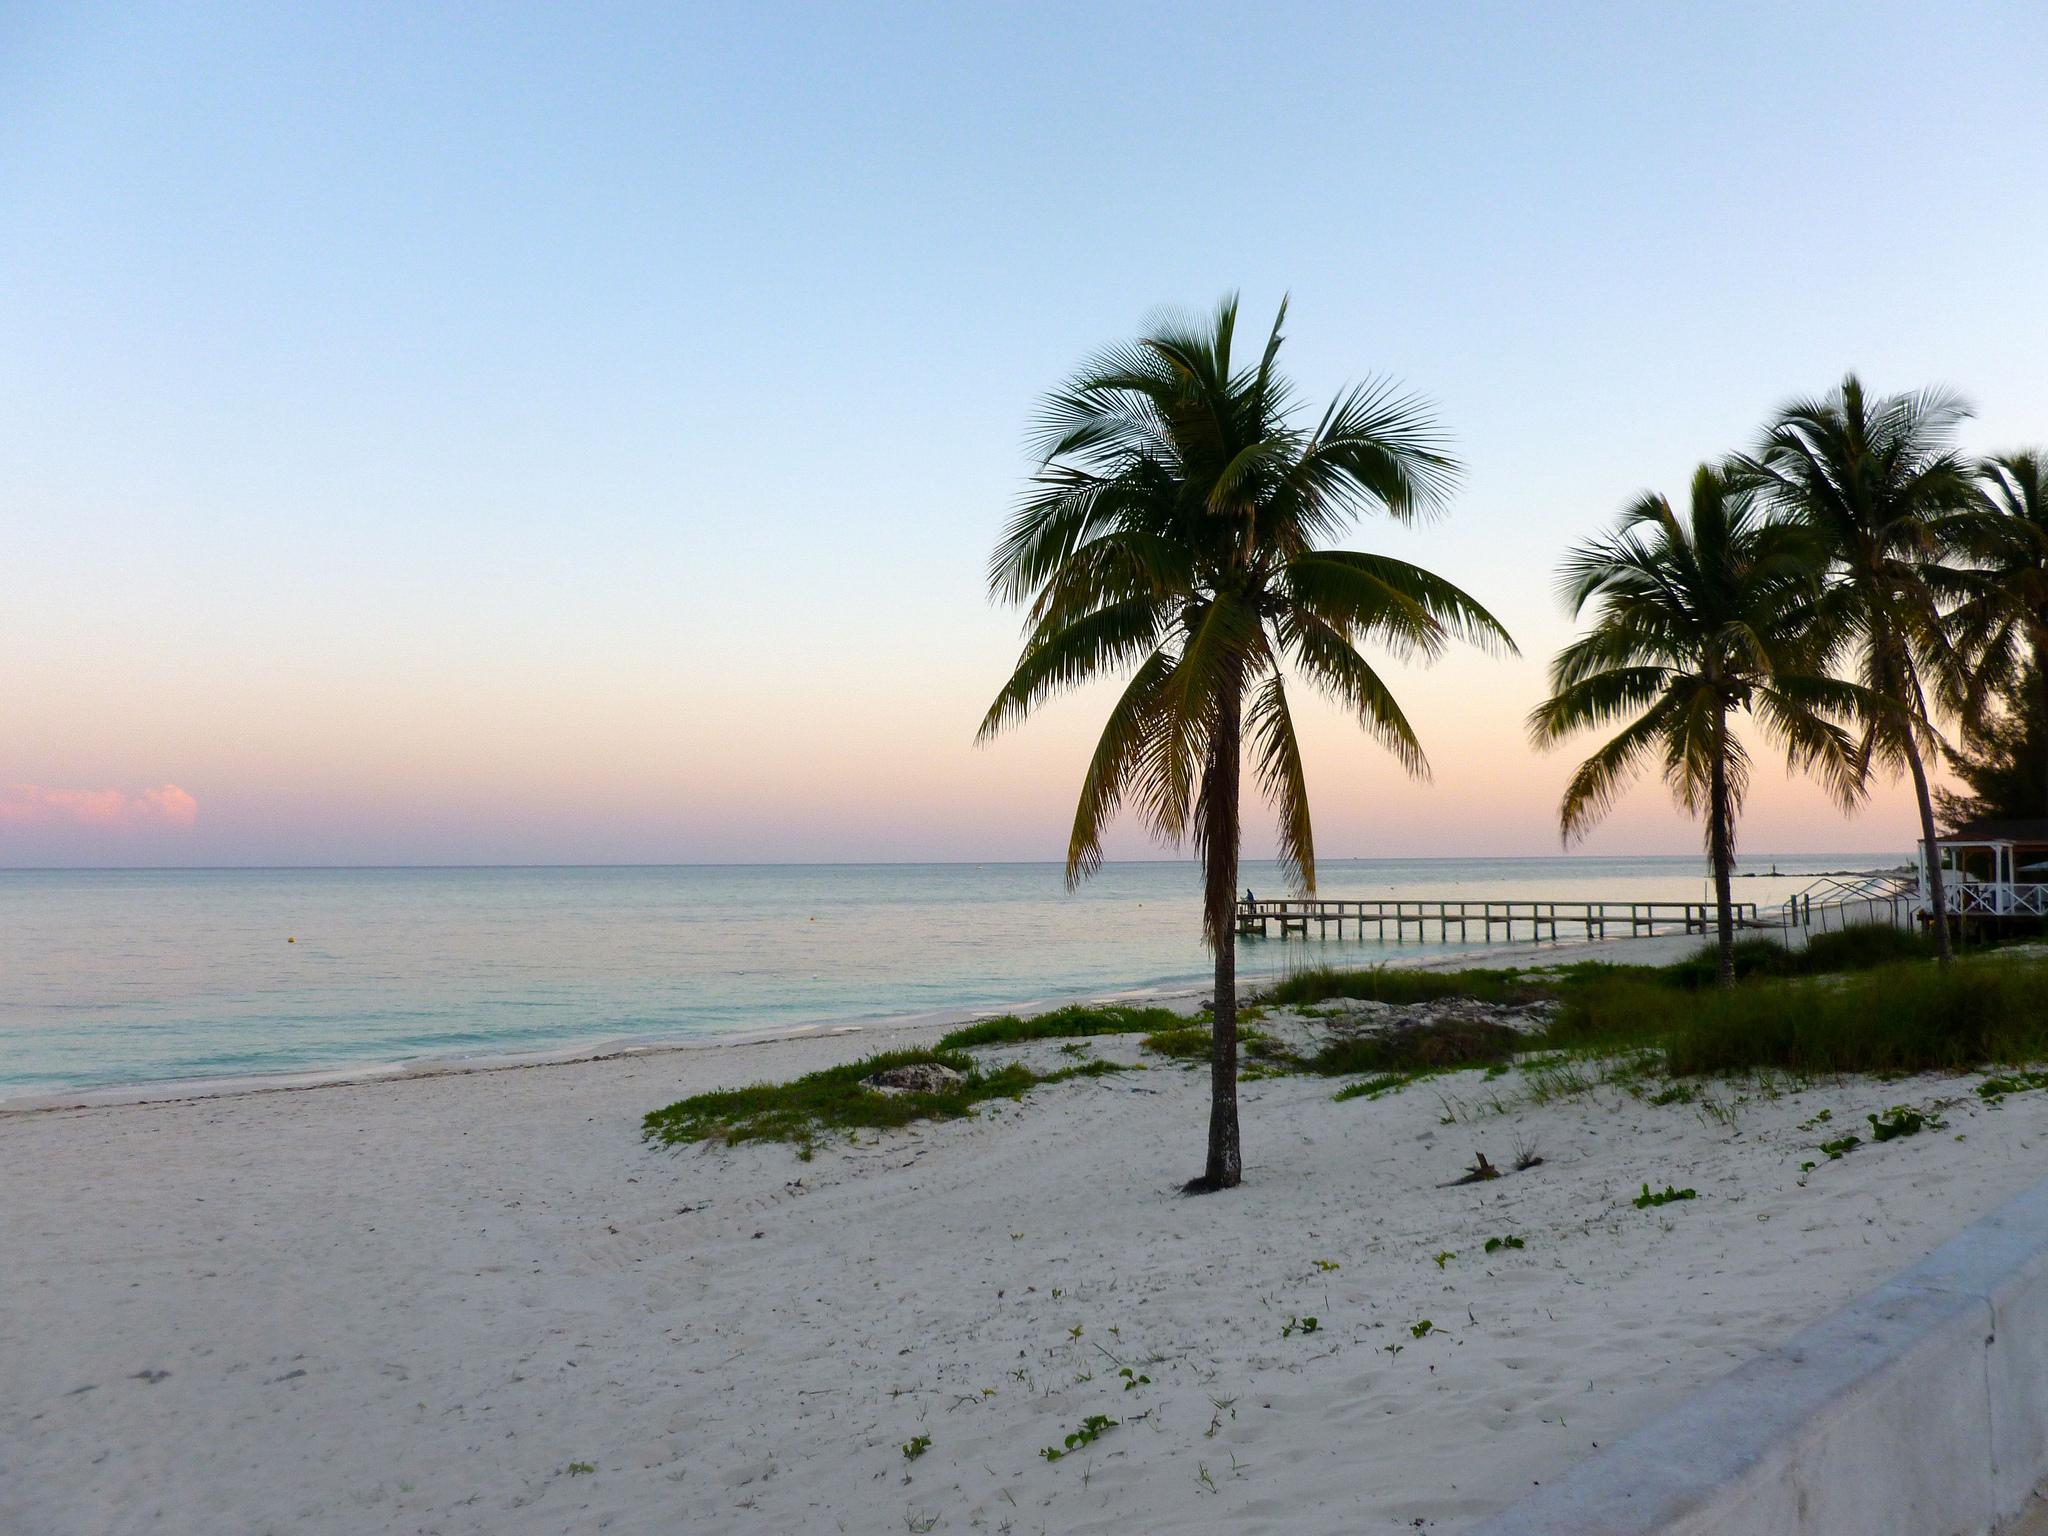 bahamas-parcul-de-la-plaja-taino-secret-world